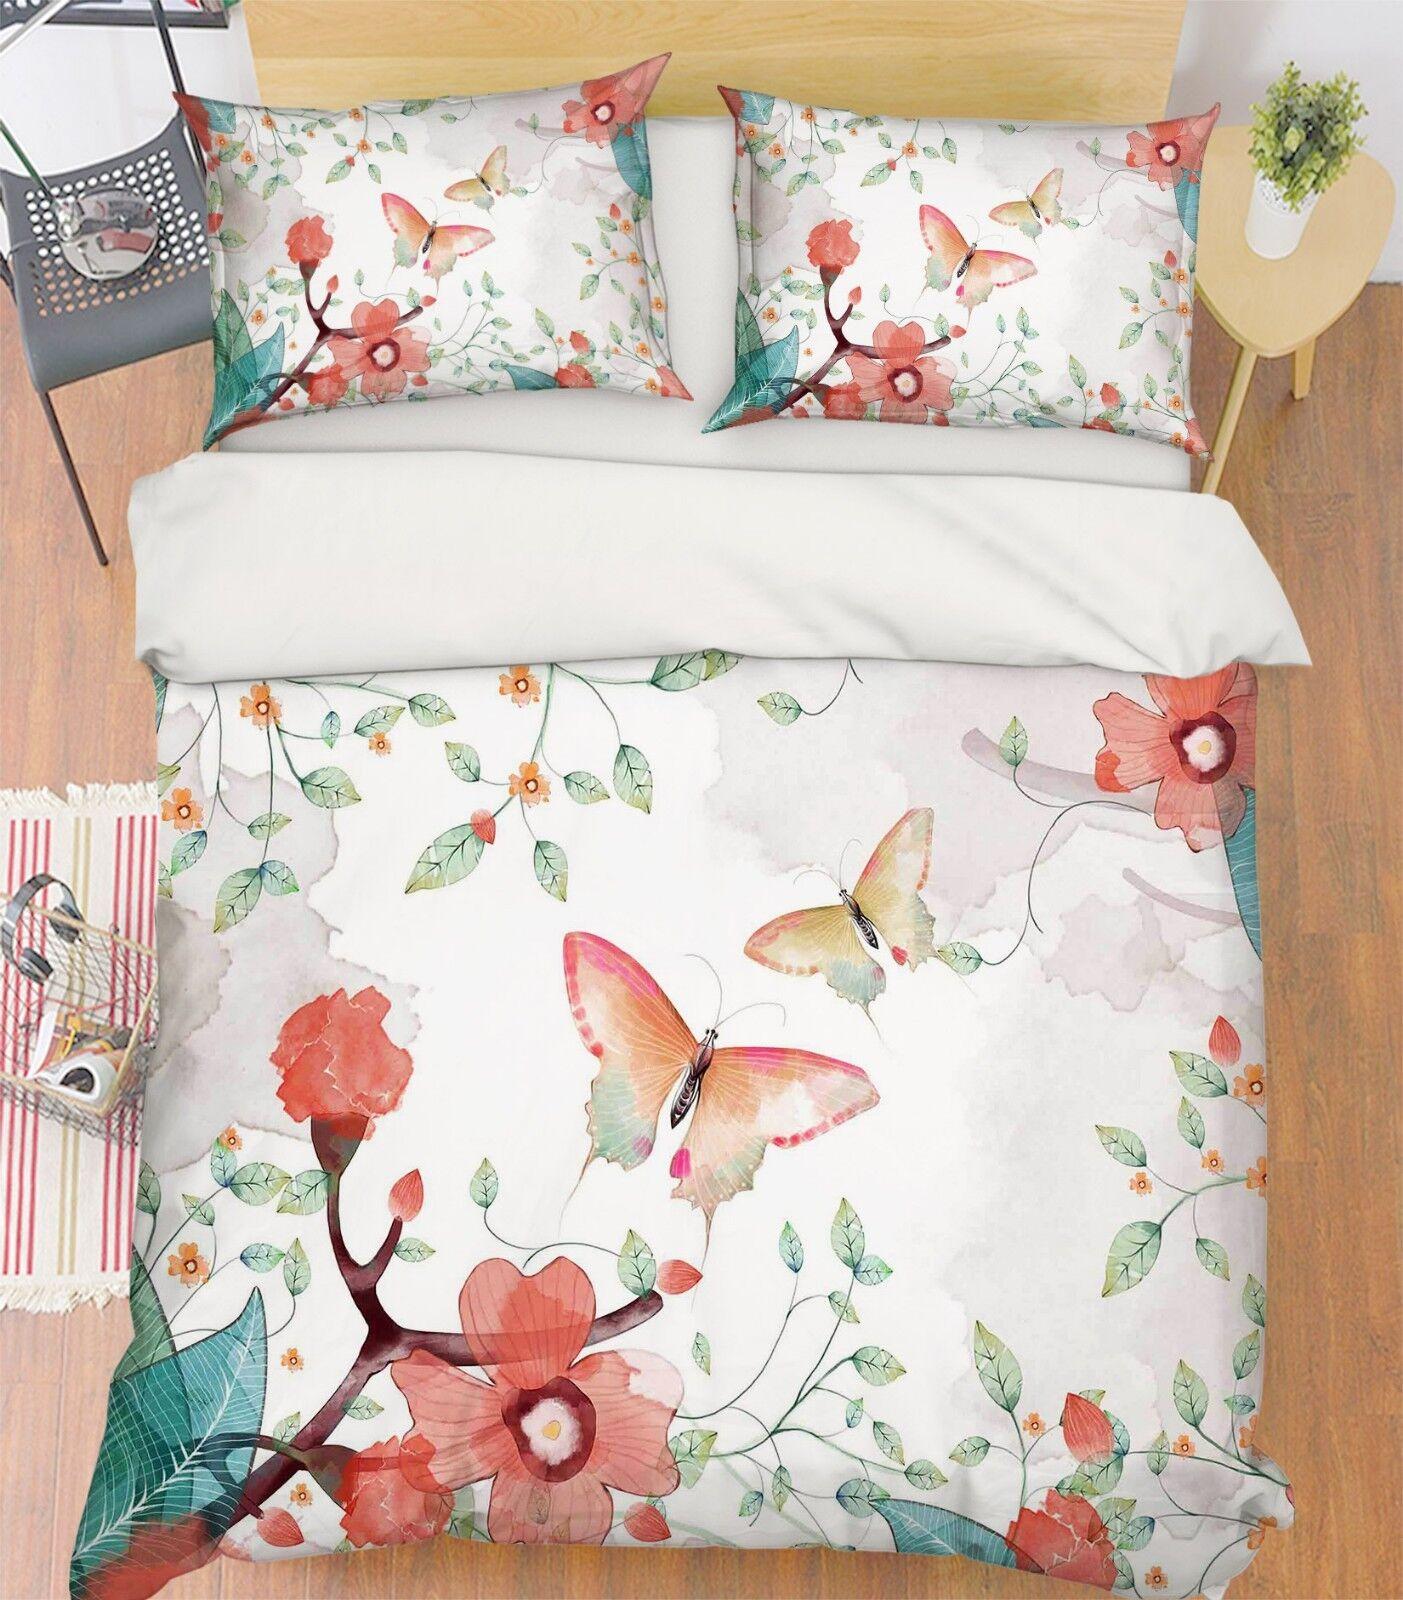 3D Butterfly Leaf 66 Bed Pillowcases Quilt Duvet Cover Set Single King UK Summer